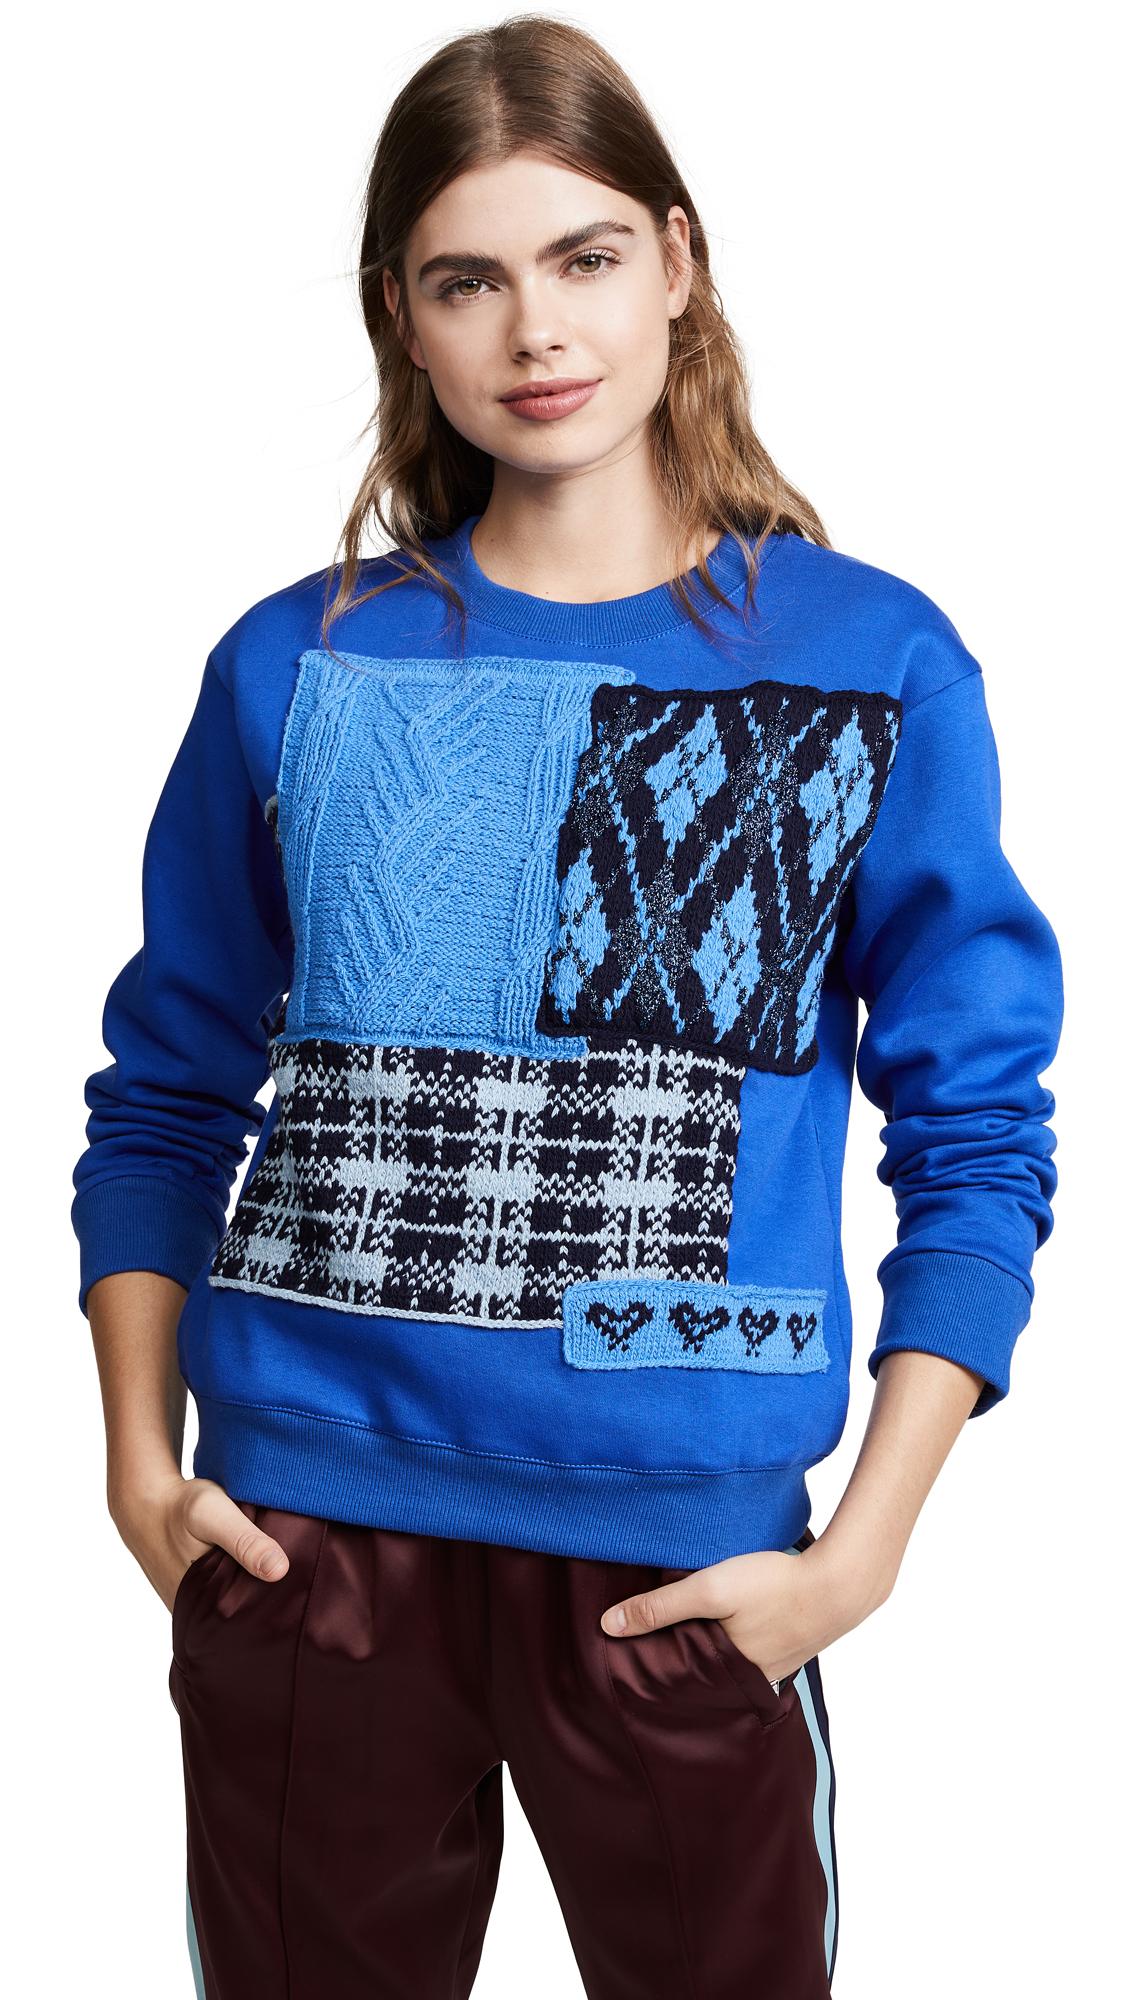 MICHAELA BUERGER Plaid Sweater in Blue Multi